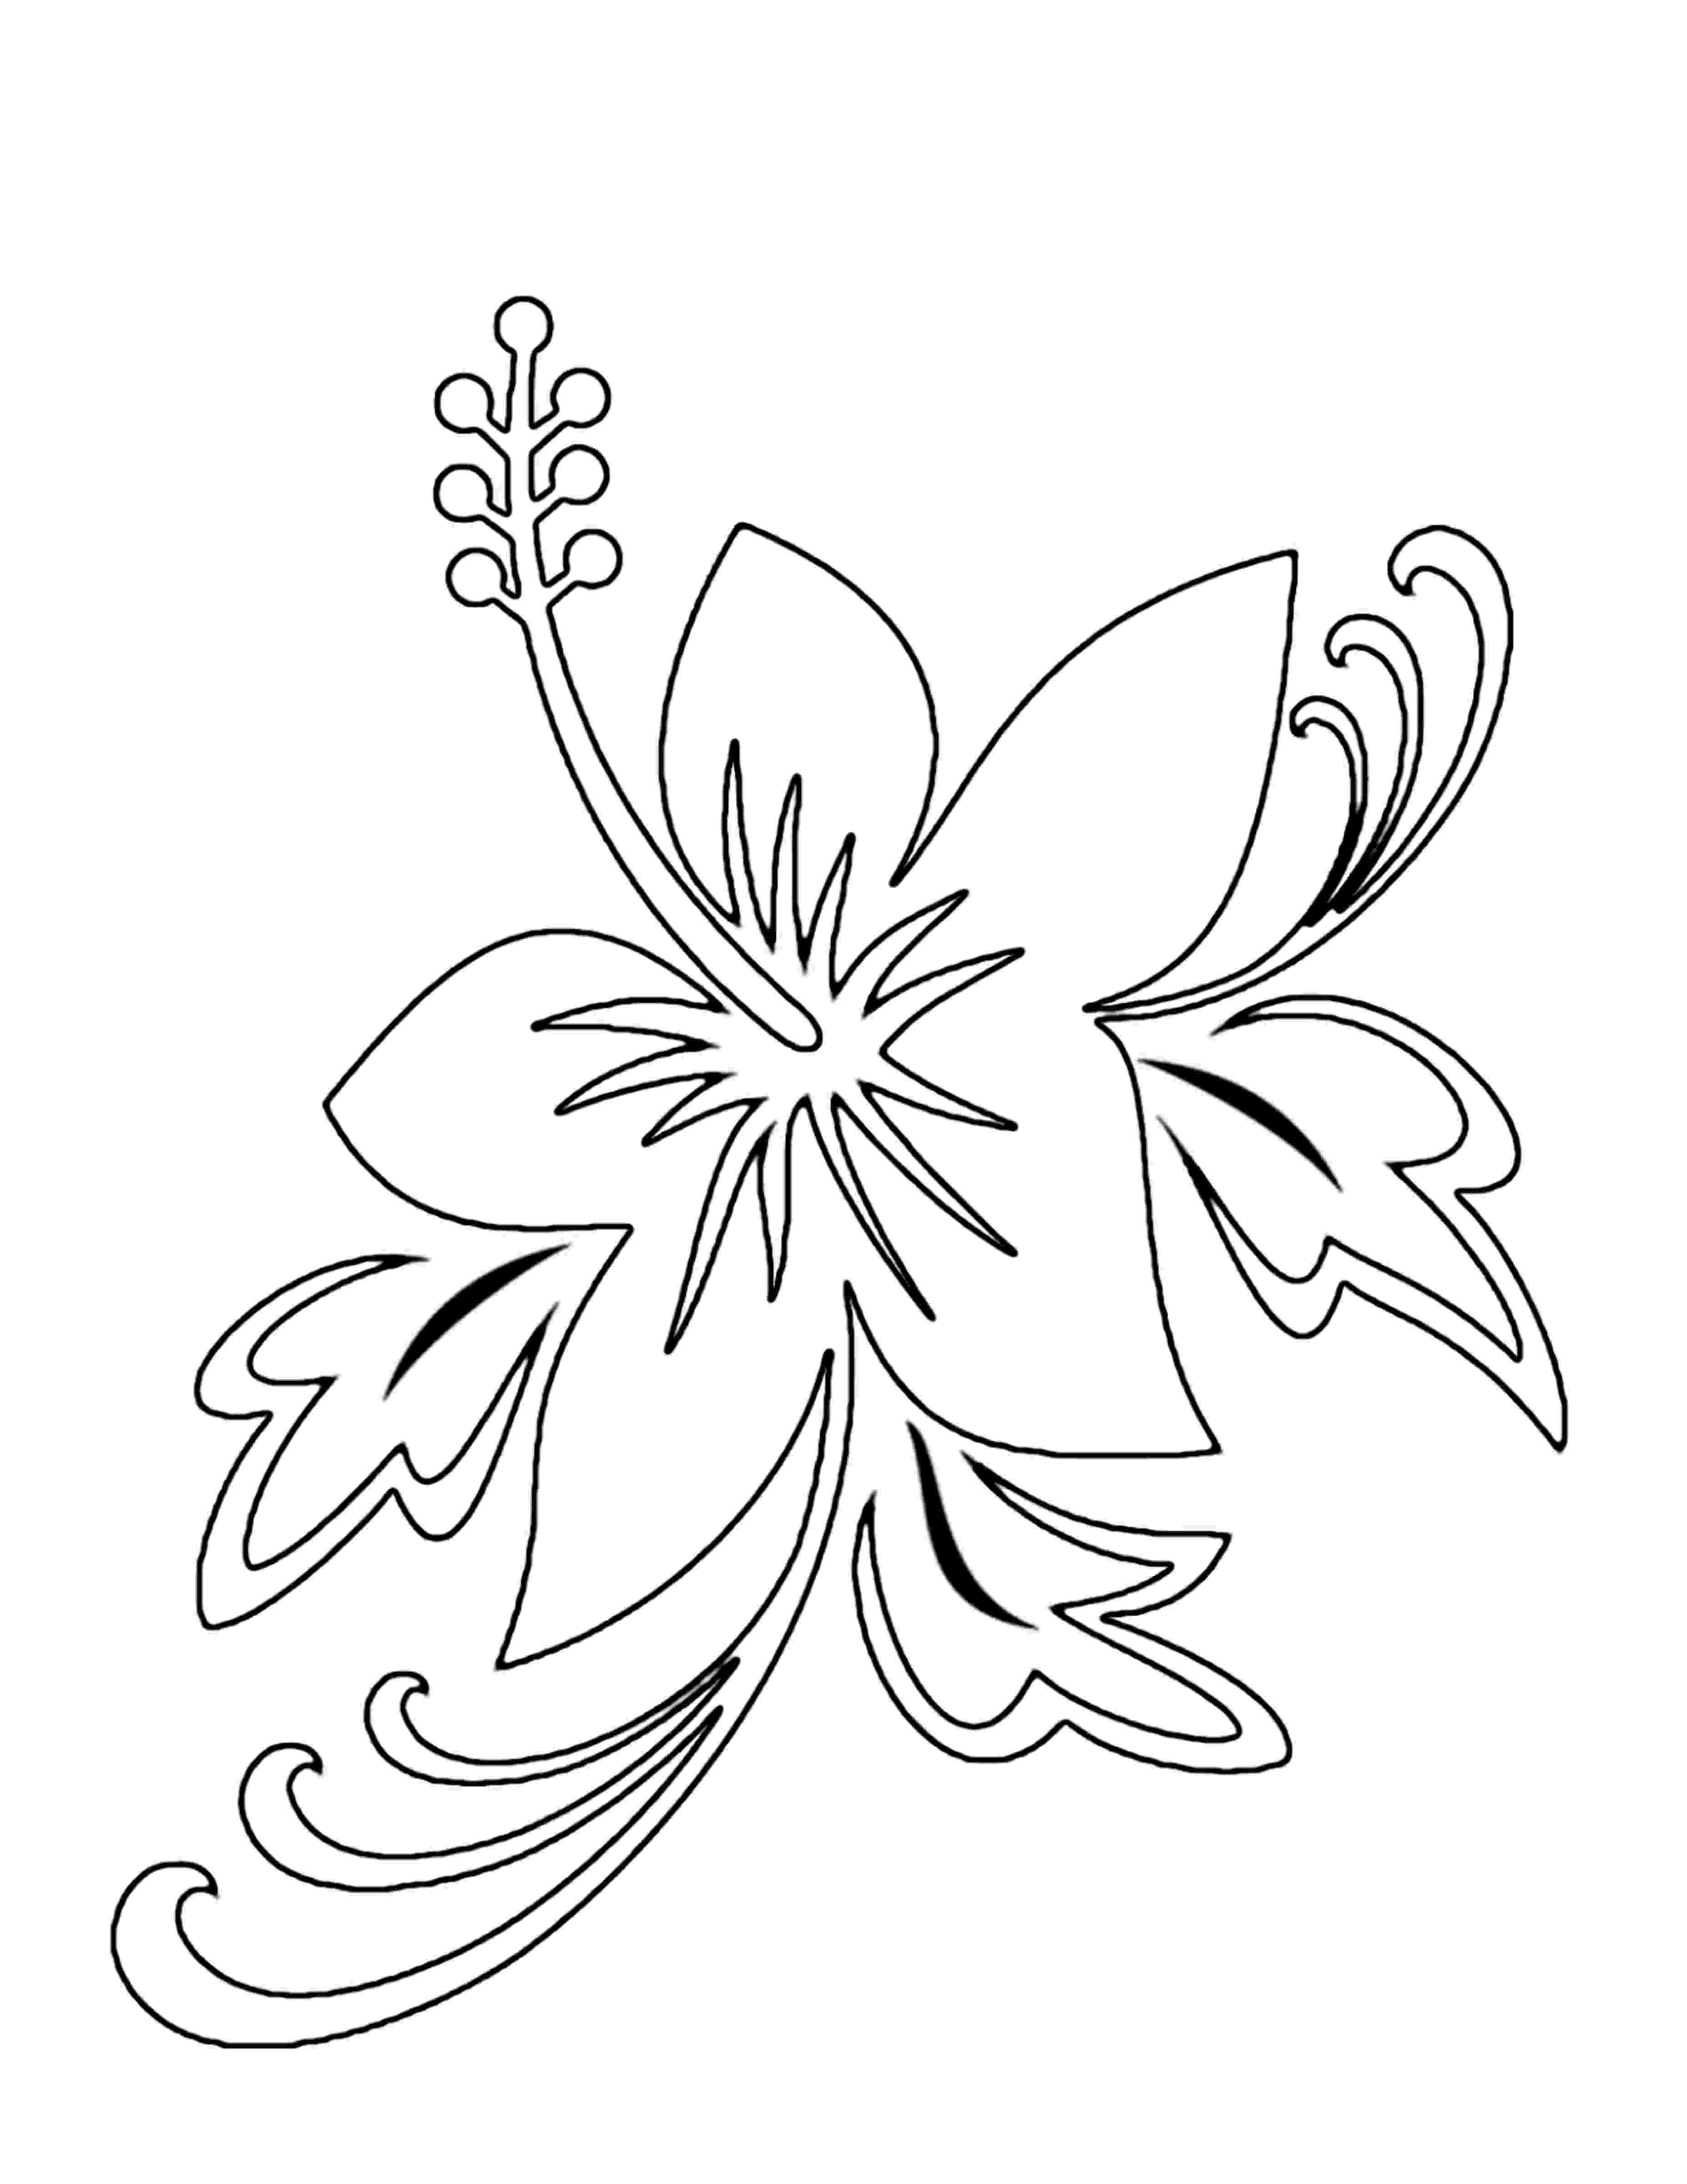 flower printables free printable flower coloring pages for kids best flower printables 1 1